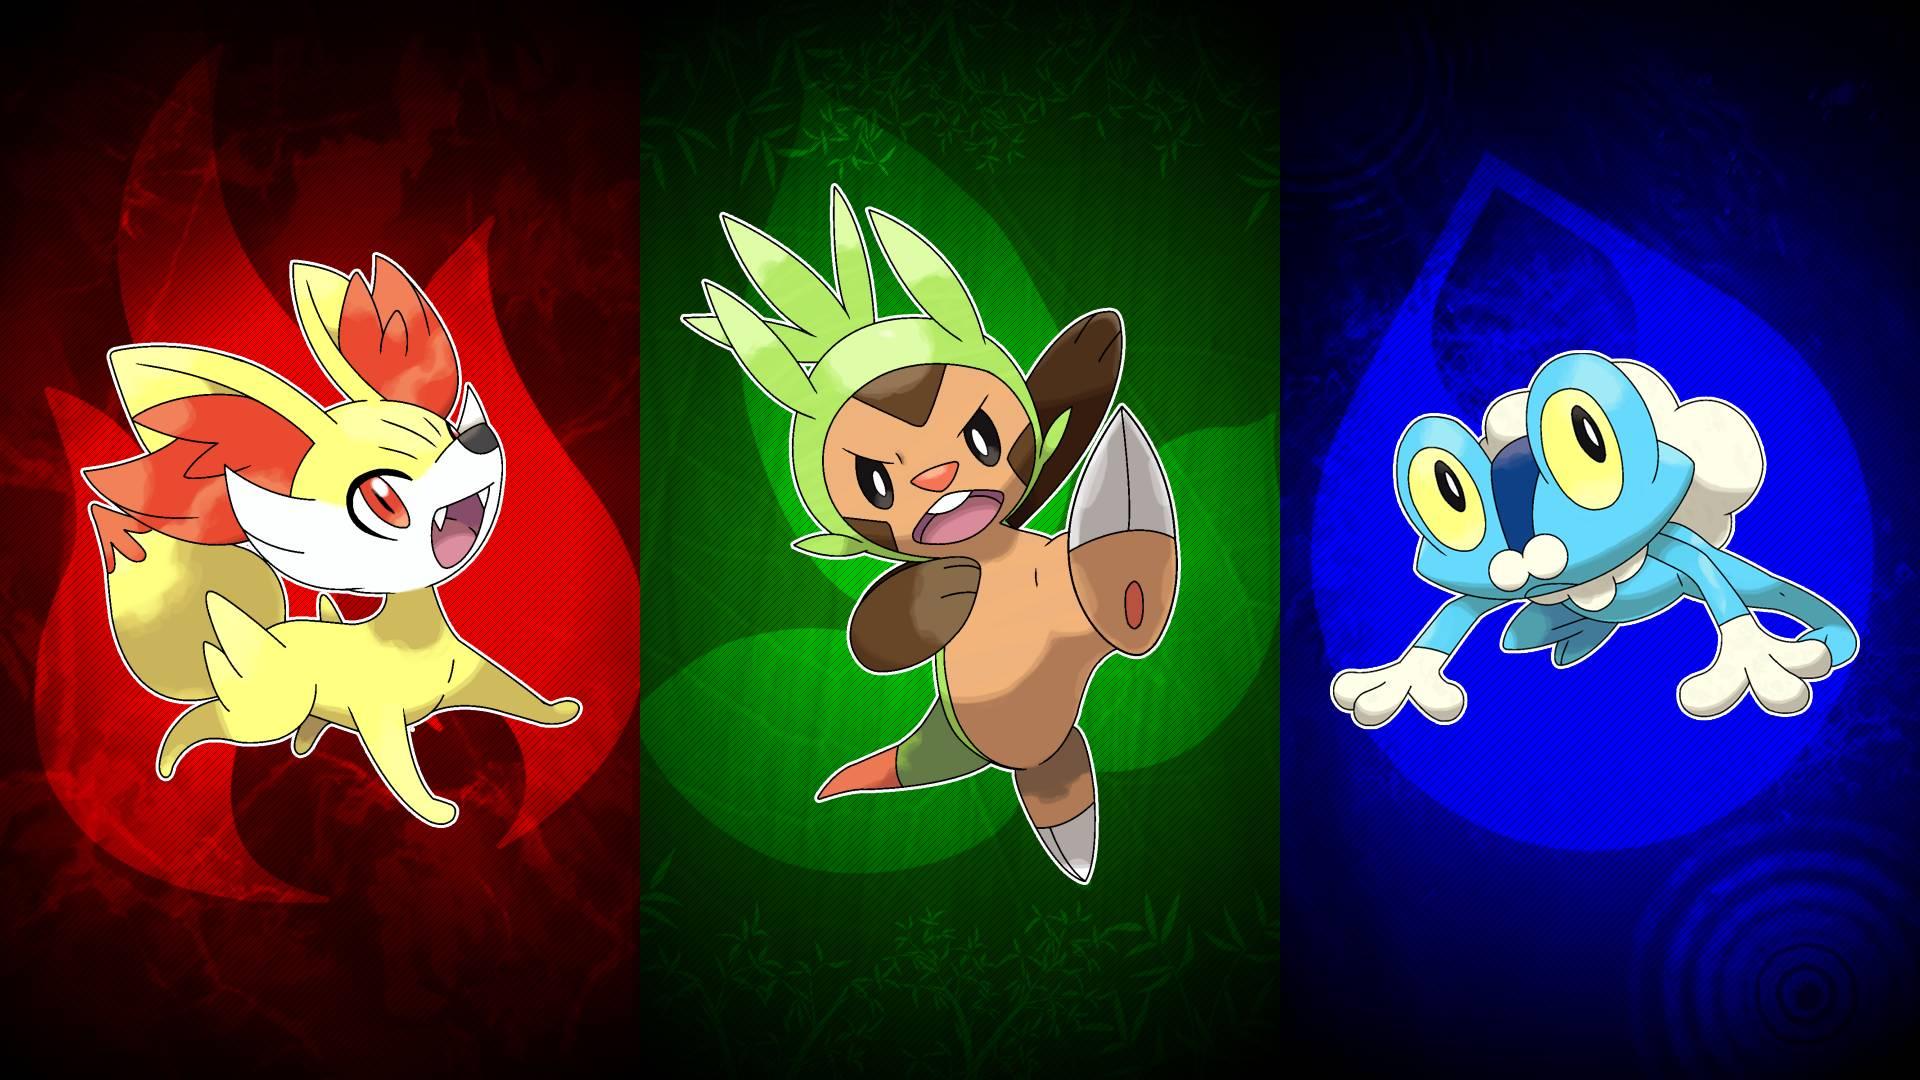 Hd wallpaper you need - Video Game Pokemon X Y Wallpaper